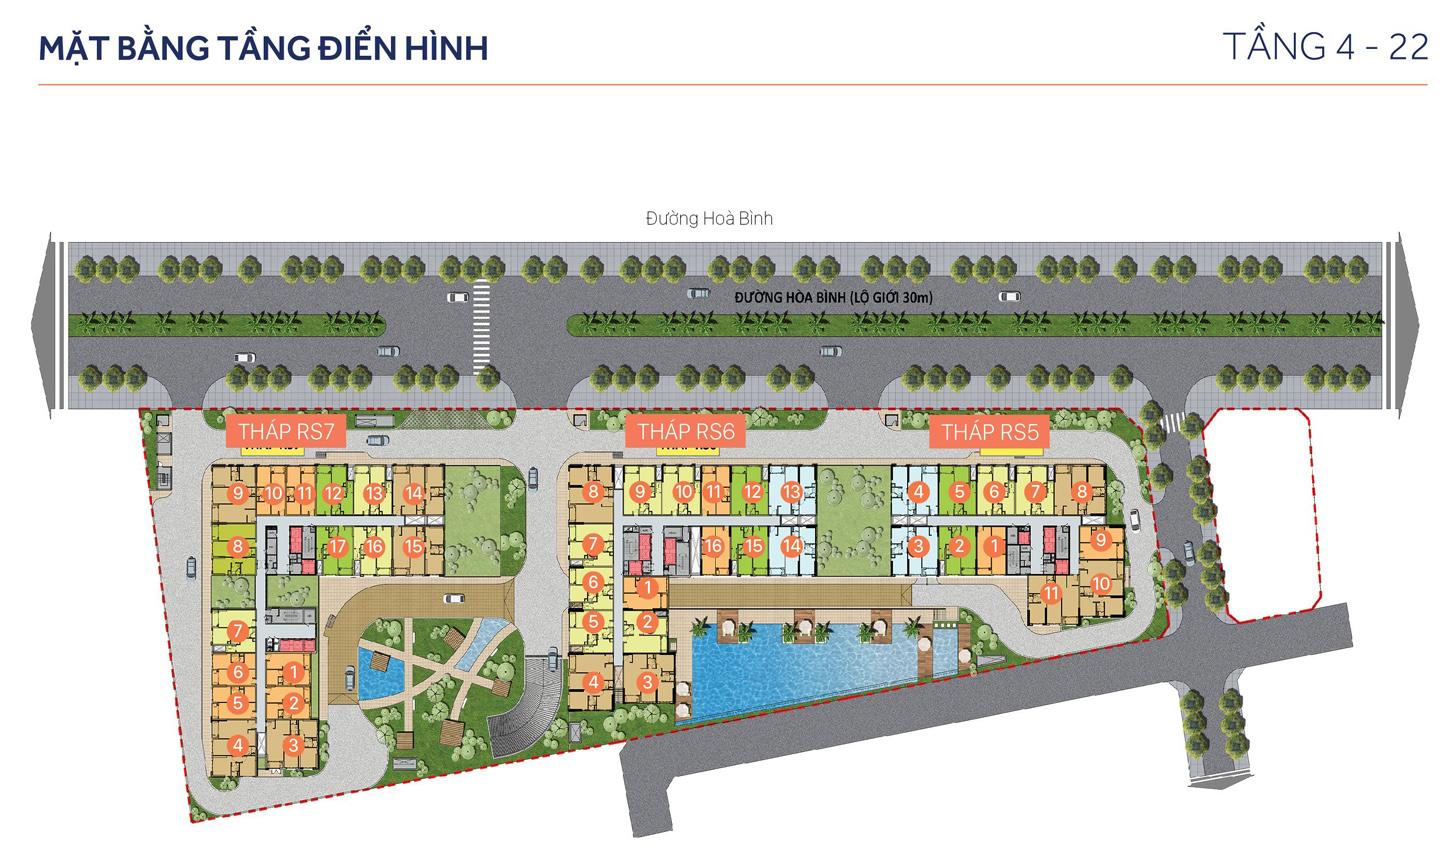 Richstar Tân Phú 8